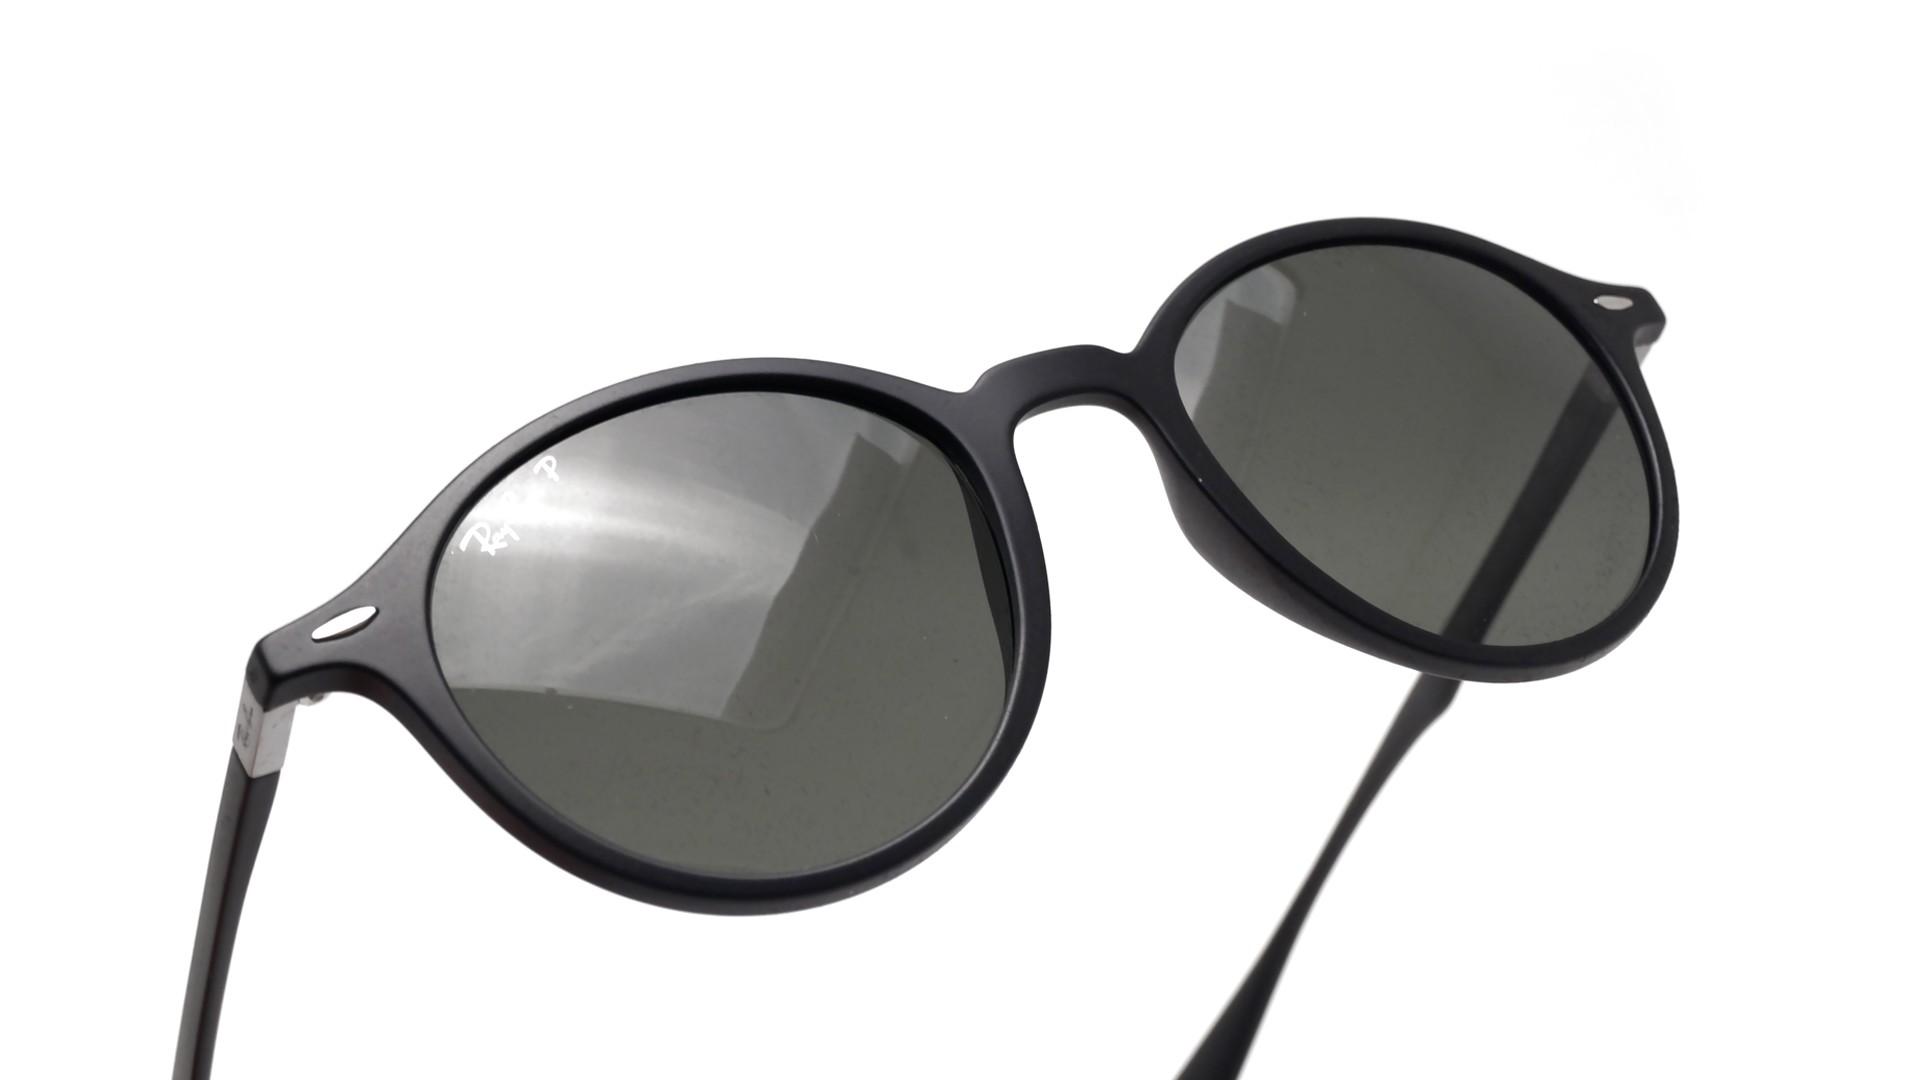 c2c0a0105a Sunglasses Ray-Ban Tech Black Matte RB4237 601S58 50-21 Medium Polarized